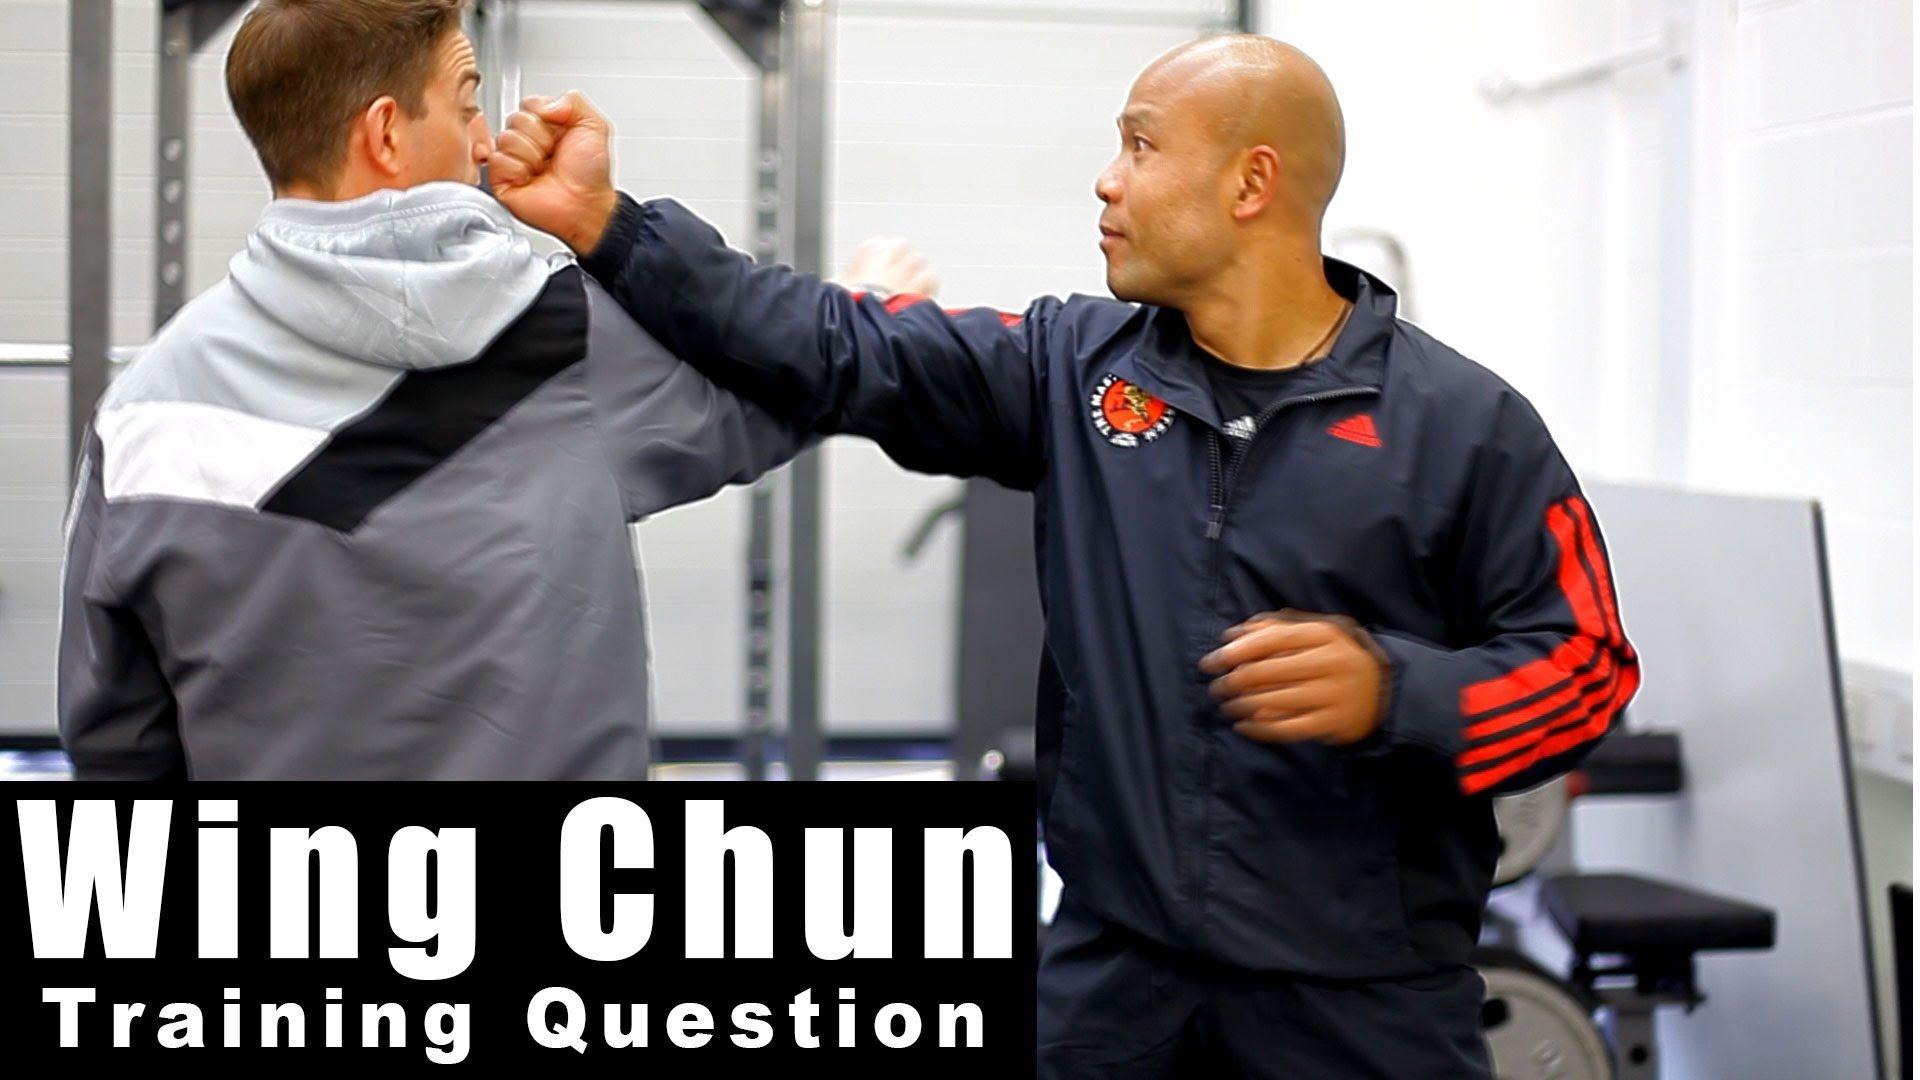 Wing Chun Techniques How To Block A Straight Punch Q1 Master Wong Wingchun Taichi Jkd Wing Chun Training Wing Chun Wing Chun Martial Arts